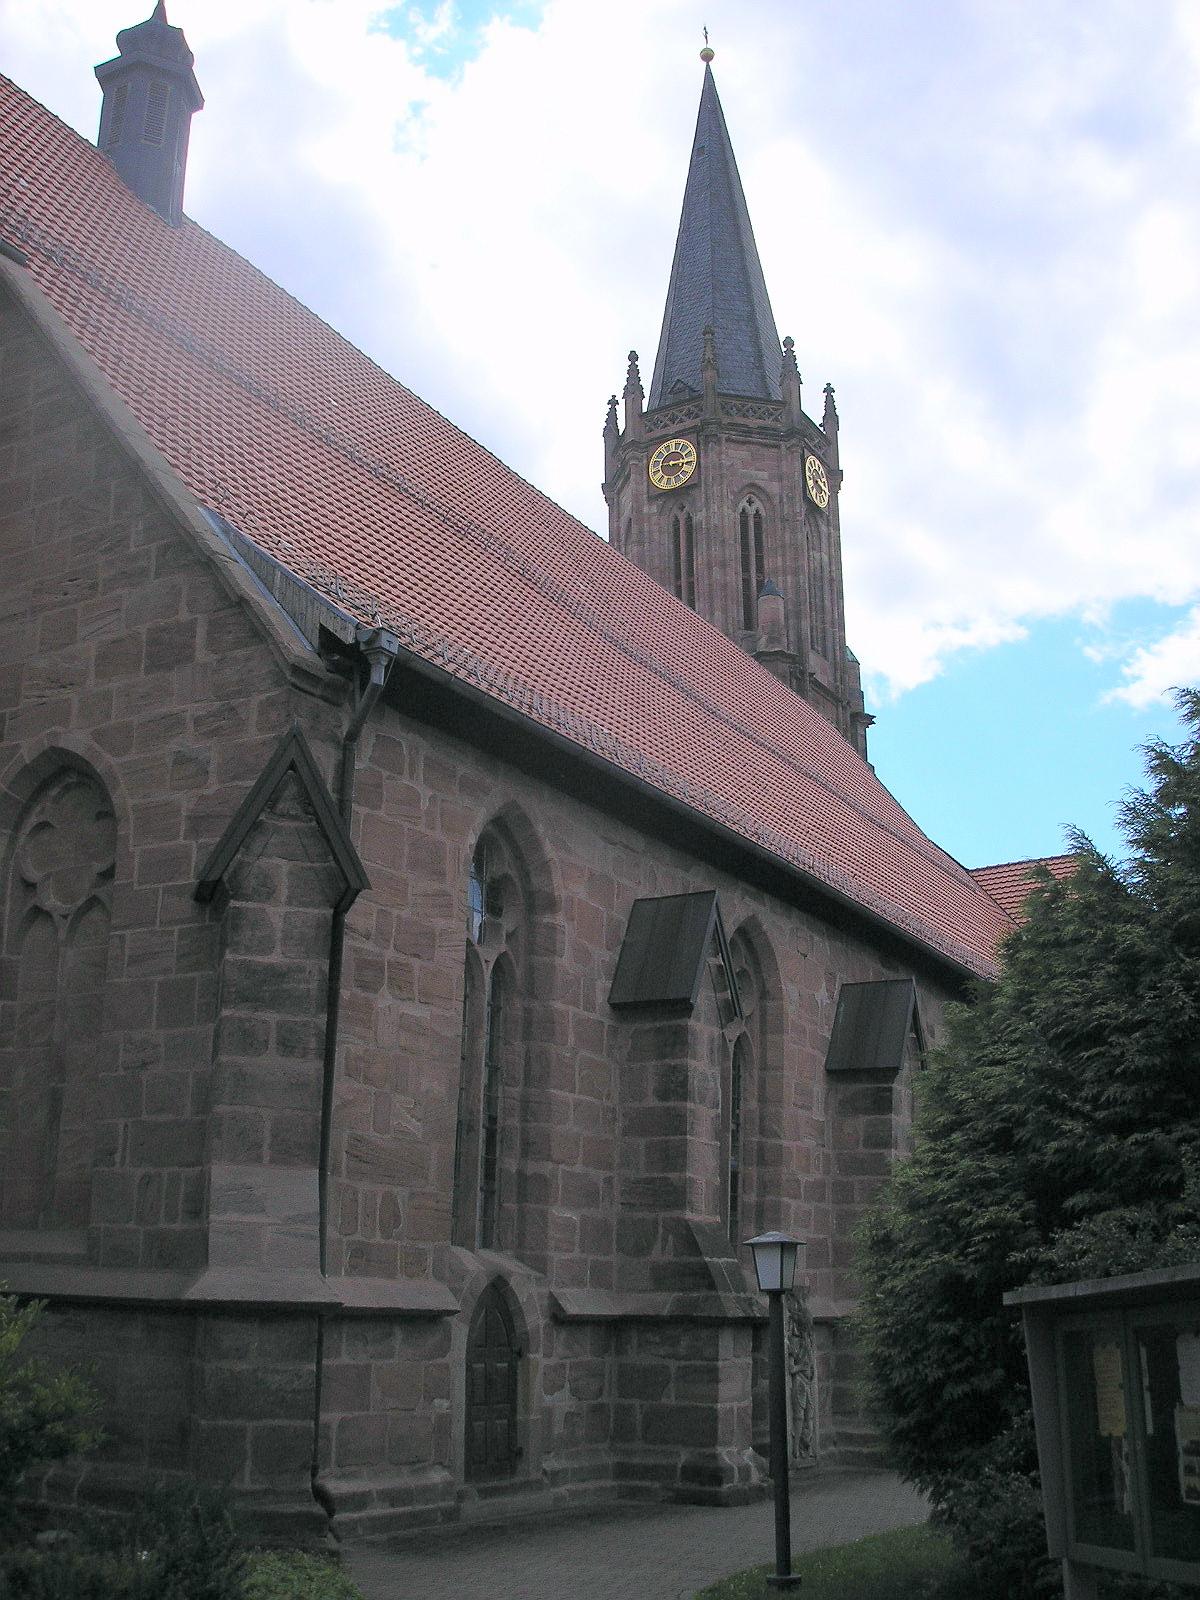 St. Aegidien